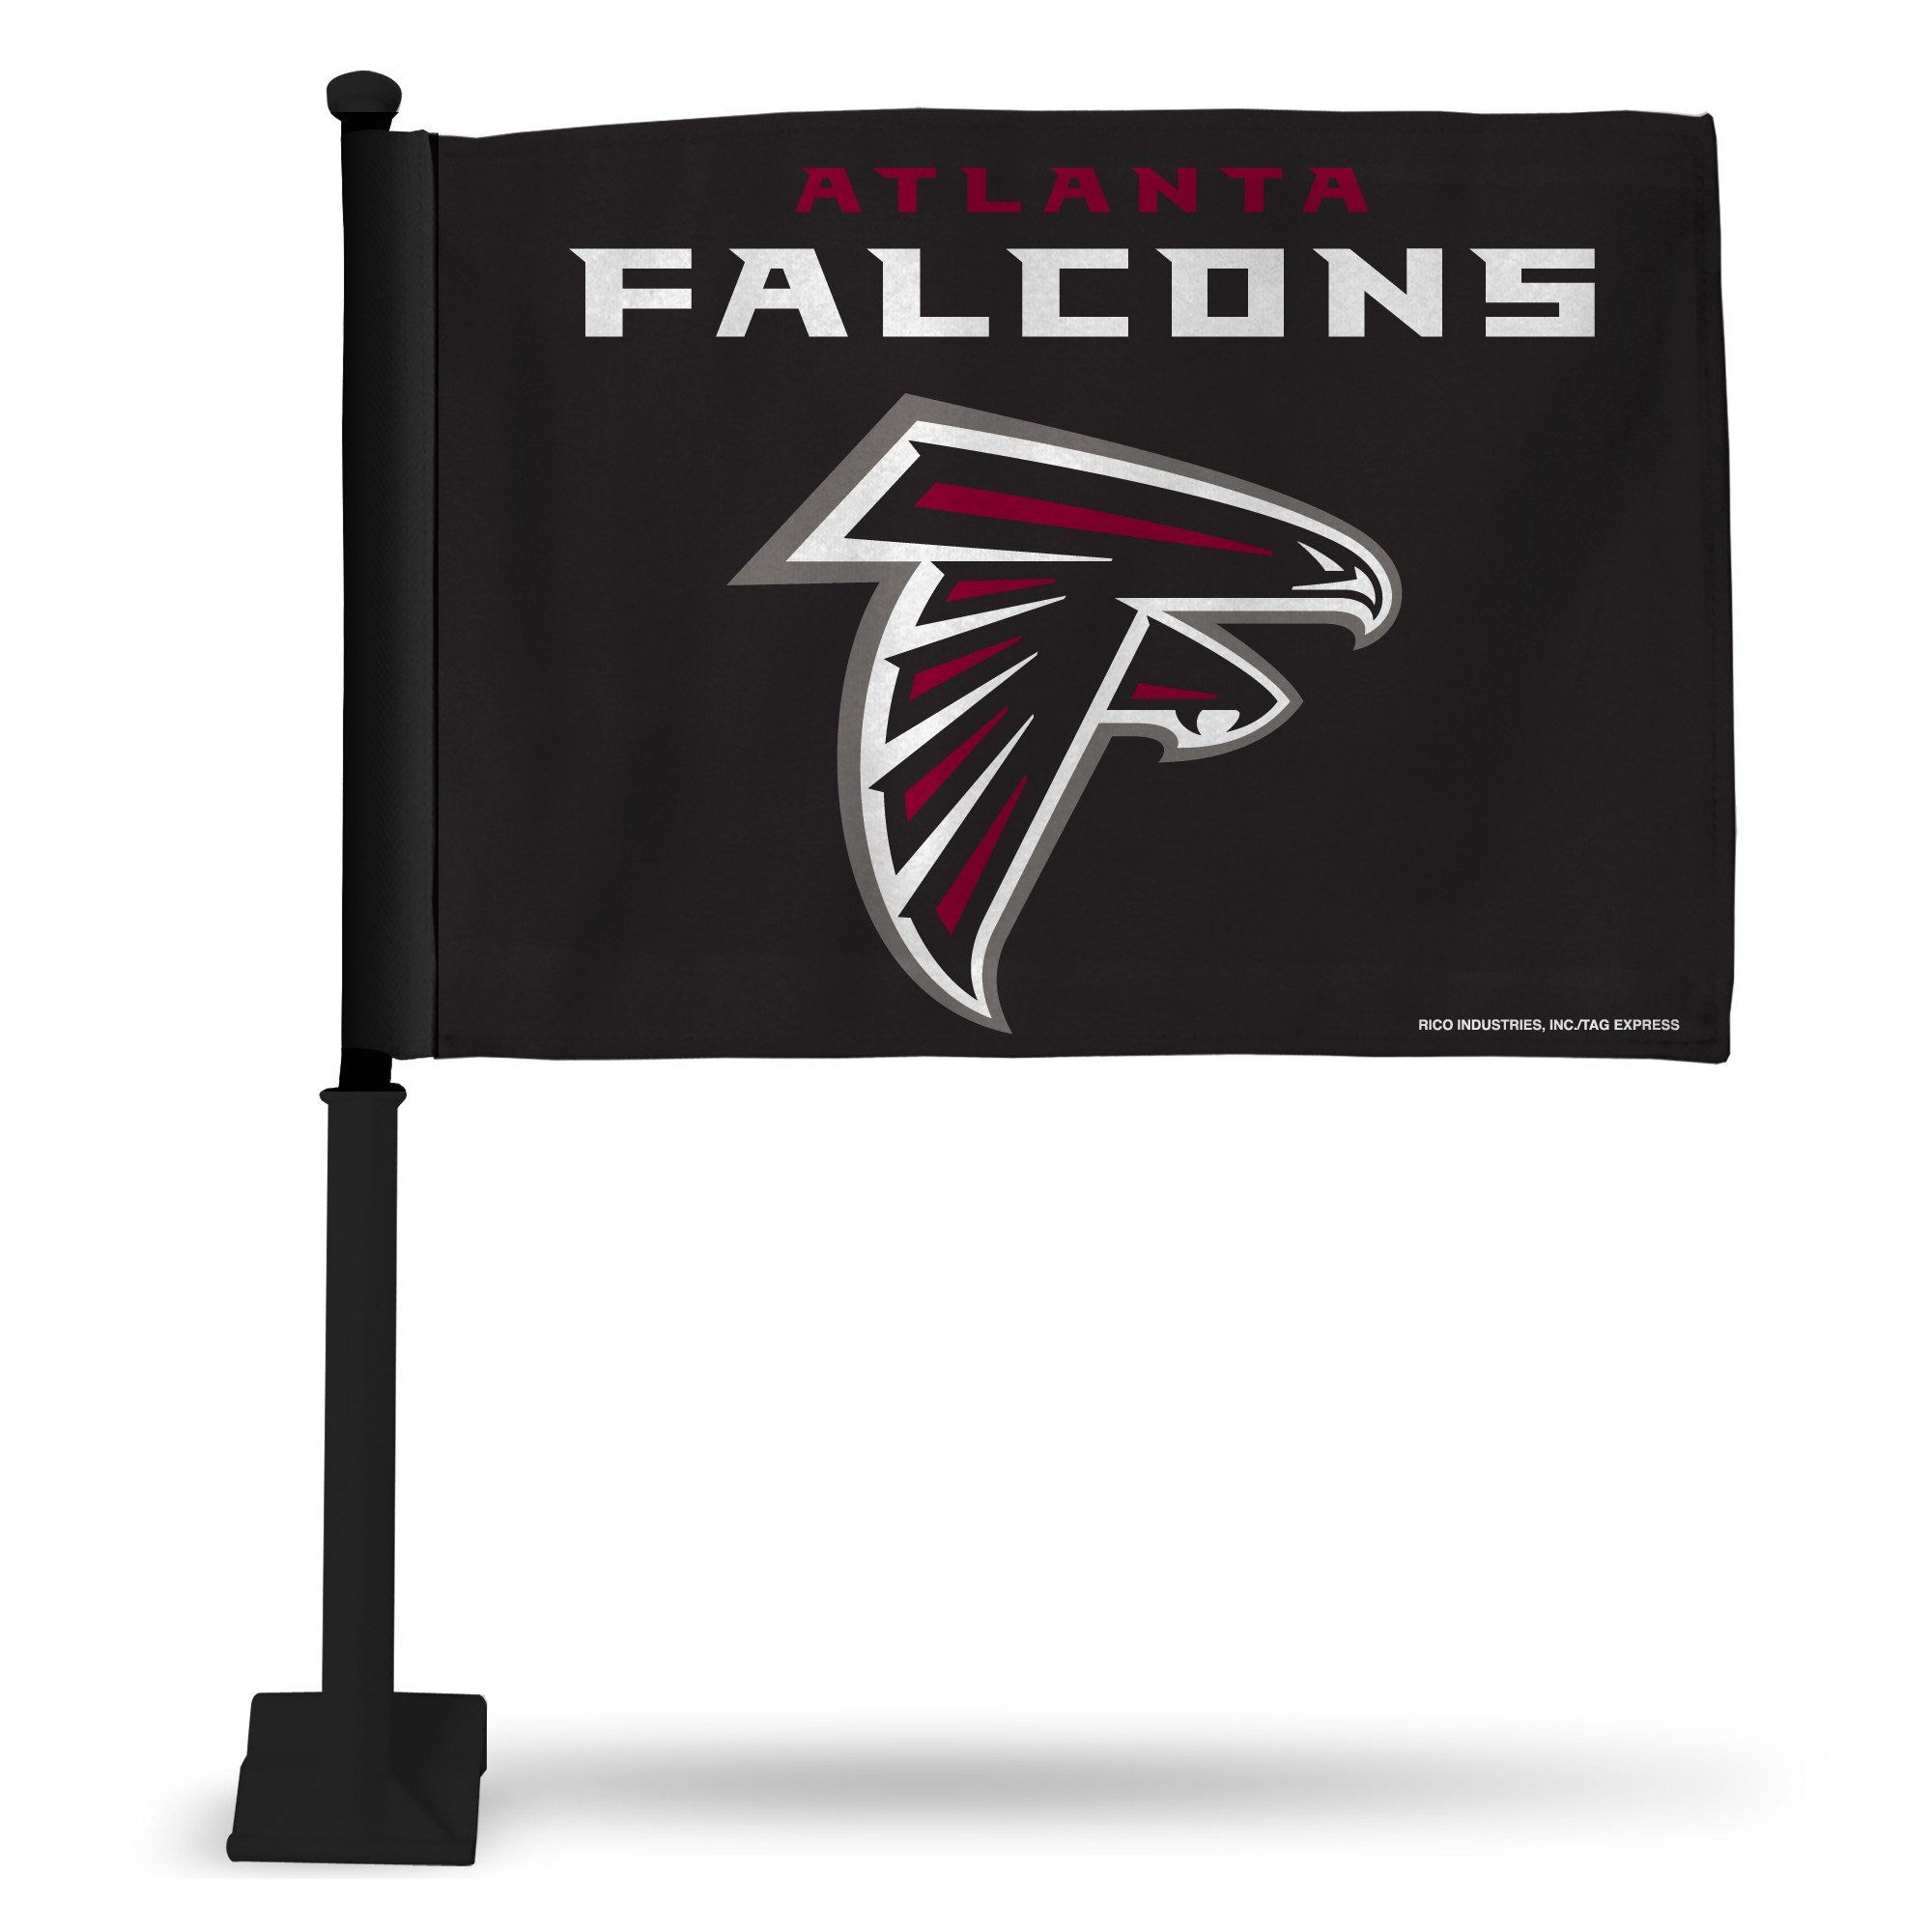 Falcons NFL Fan Flag (Car Flag) Nfl fans, Car flags